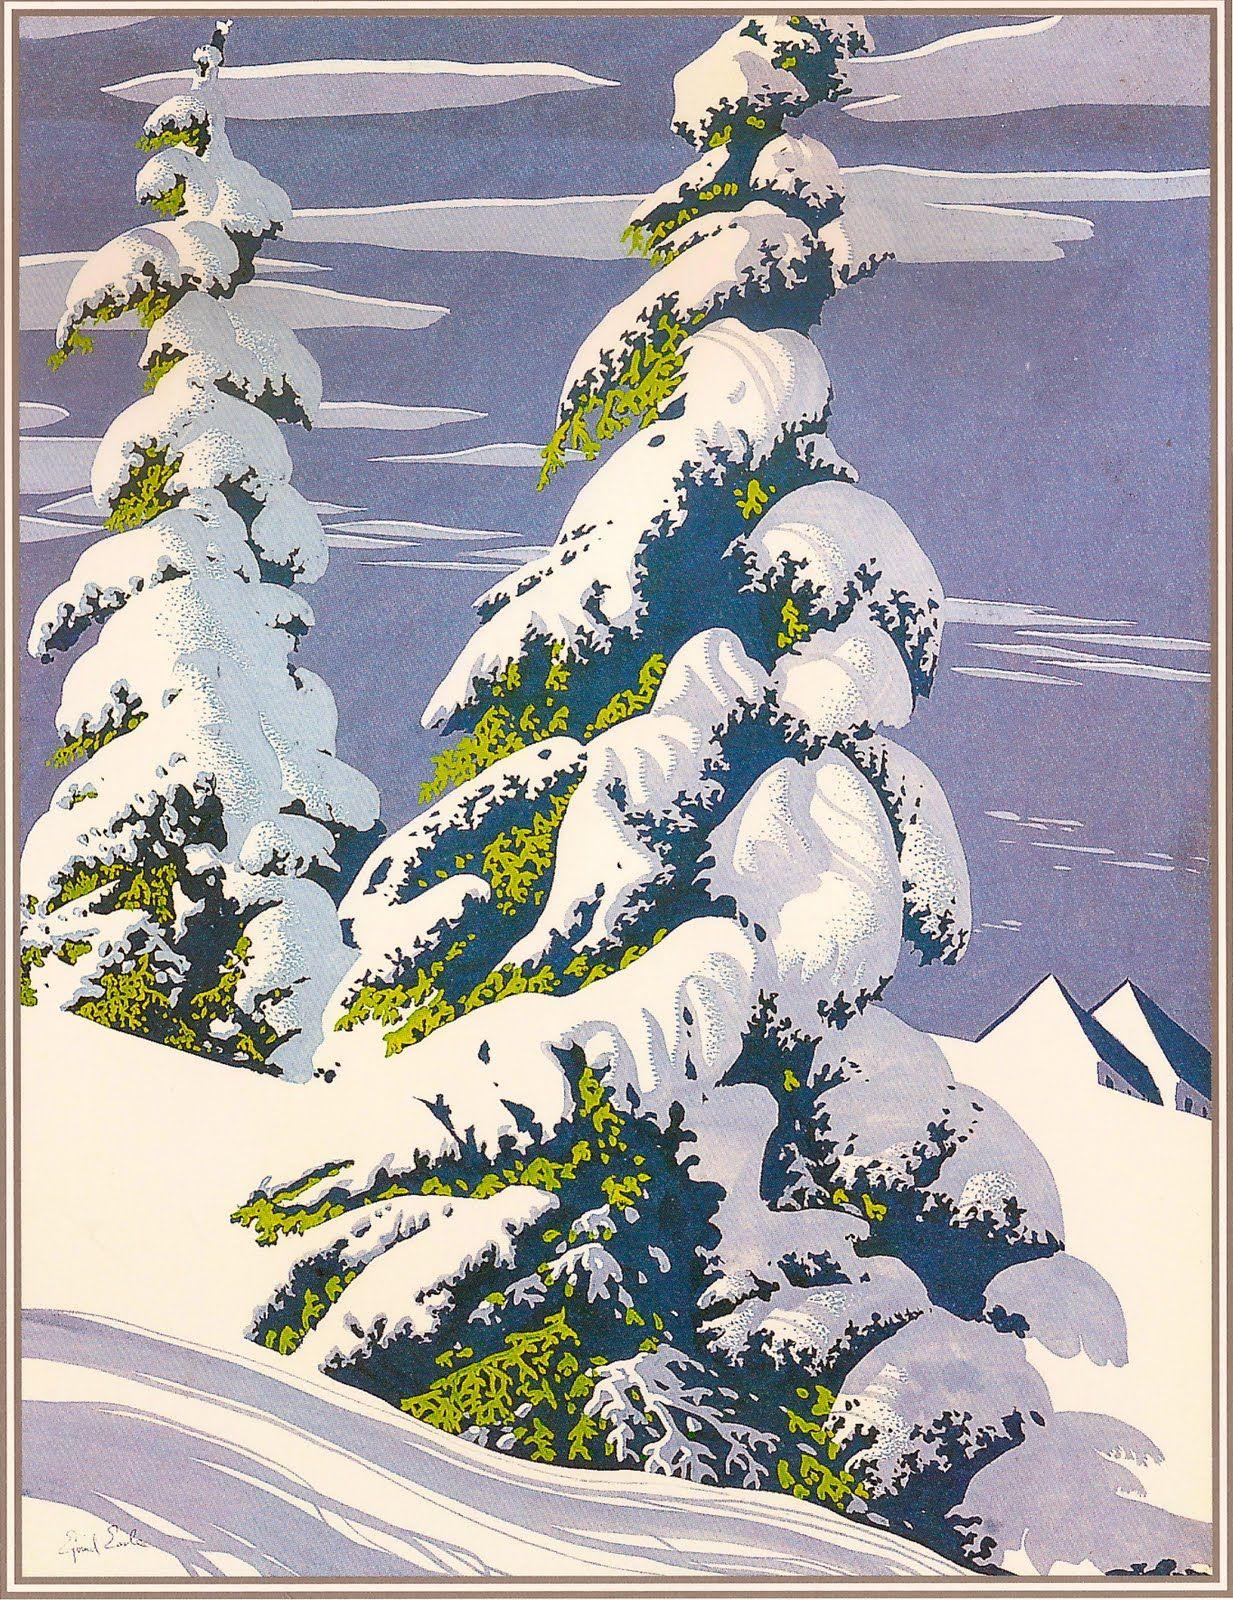 The amazing Eyvind Earle | My all time favorite Disney background artist (1950s) | Art, Winter art